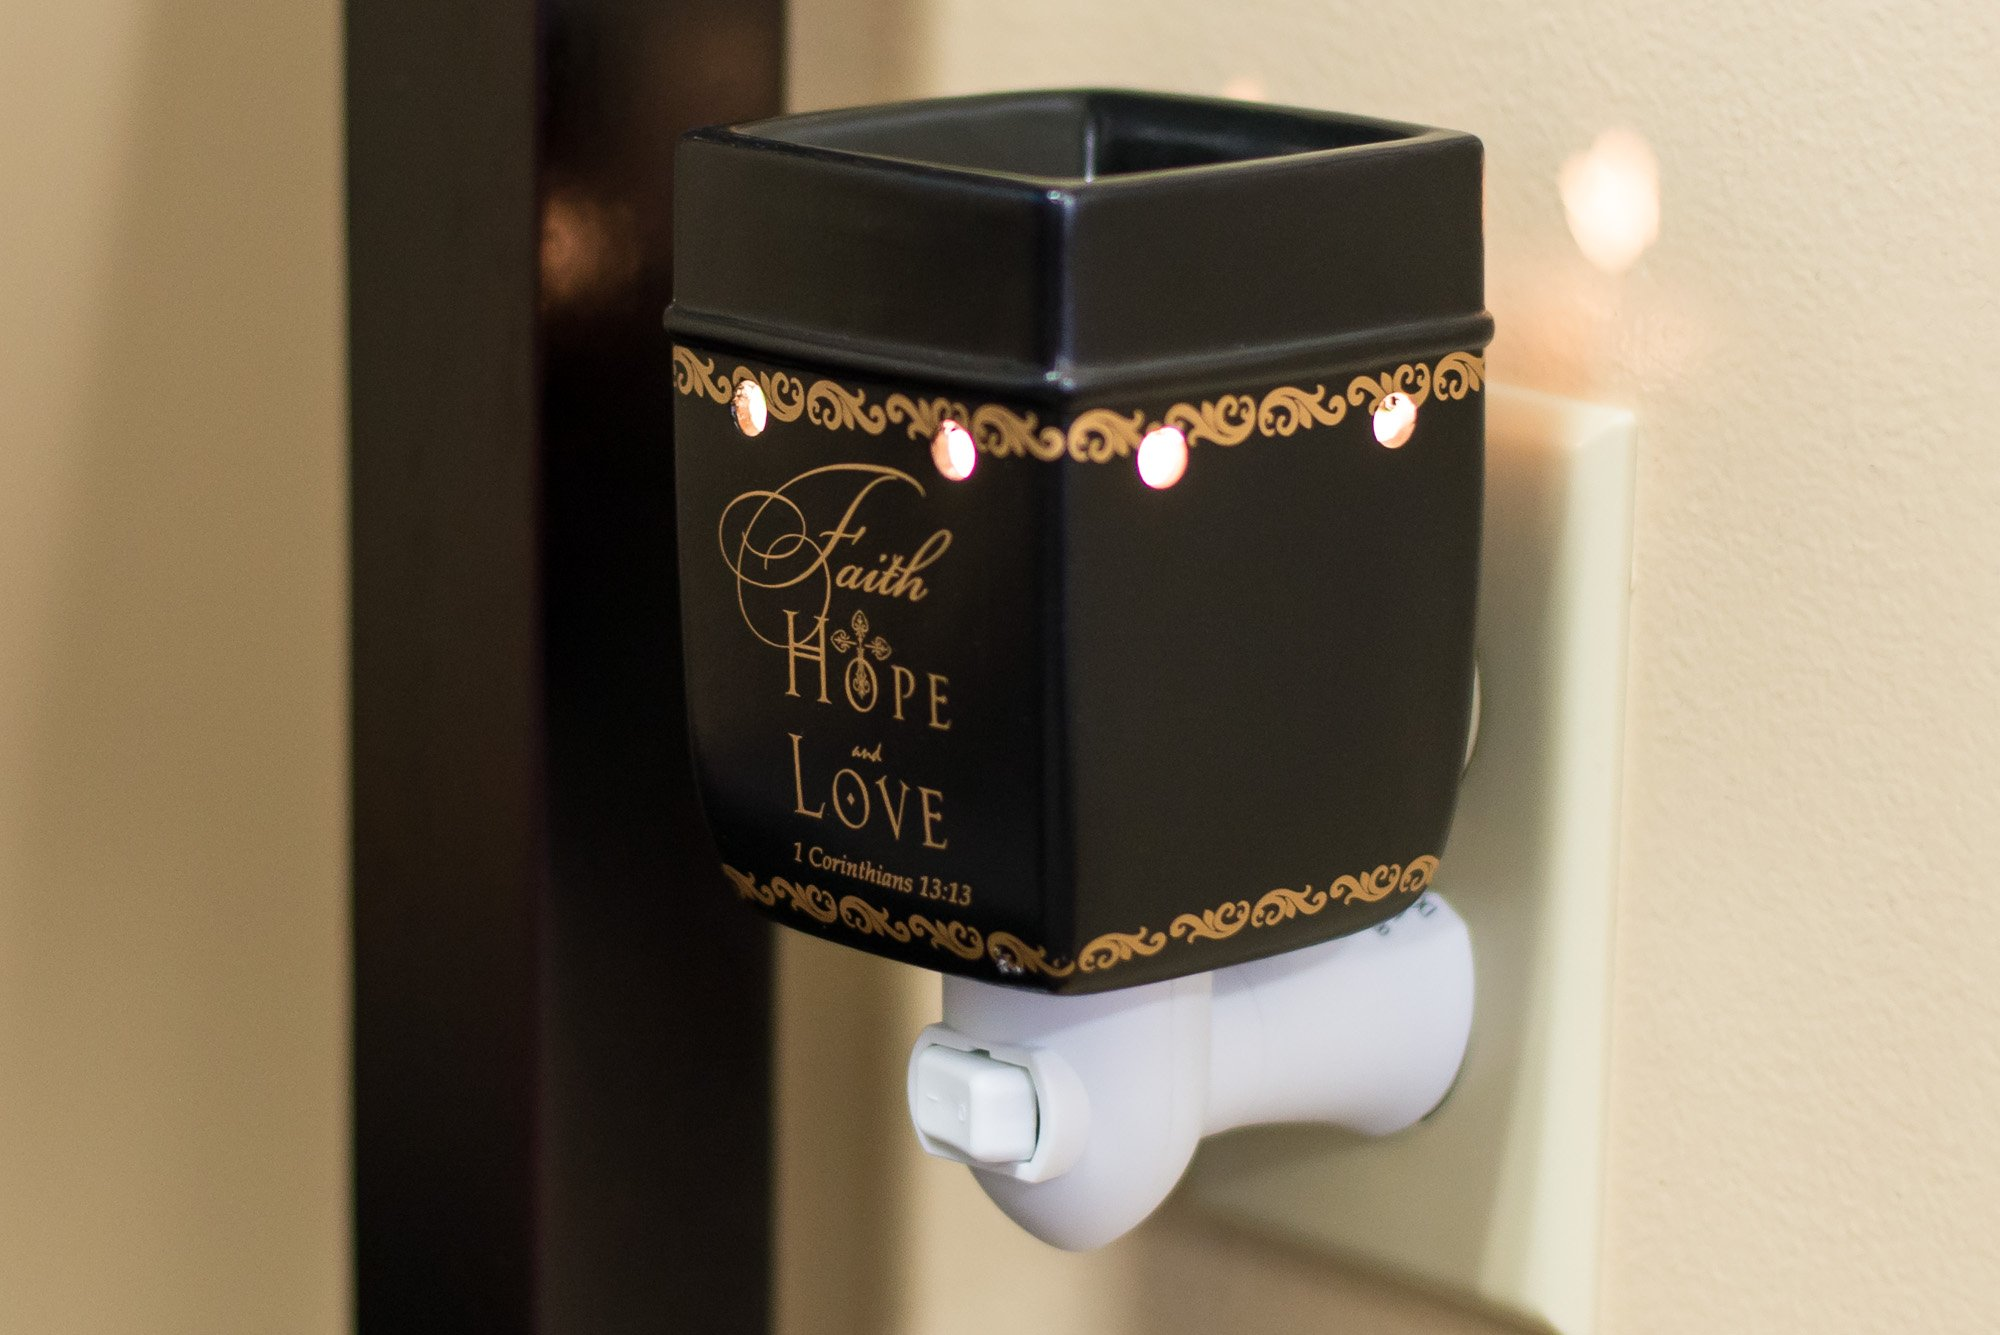 Elanze Designs Faith Hope Love 1 Corinthians 13:13 Ceramic Stoneware Plug-in Outlet Wax Oil Warmer by Elanze Designs (Image #2)